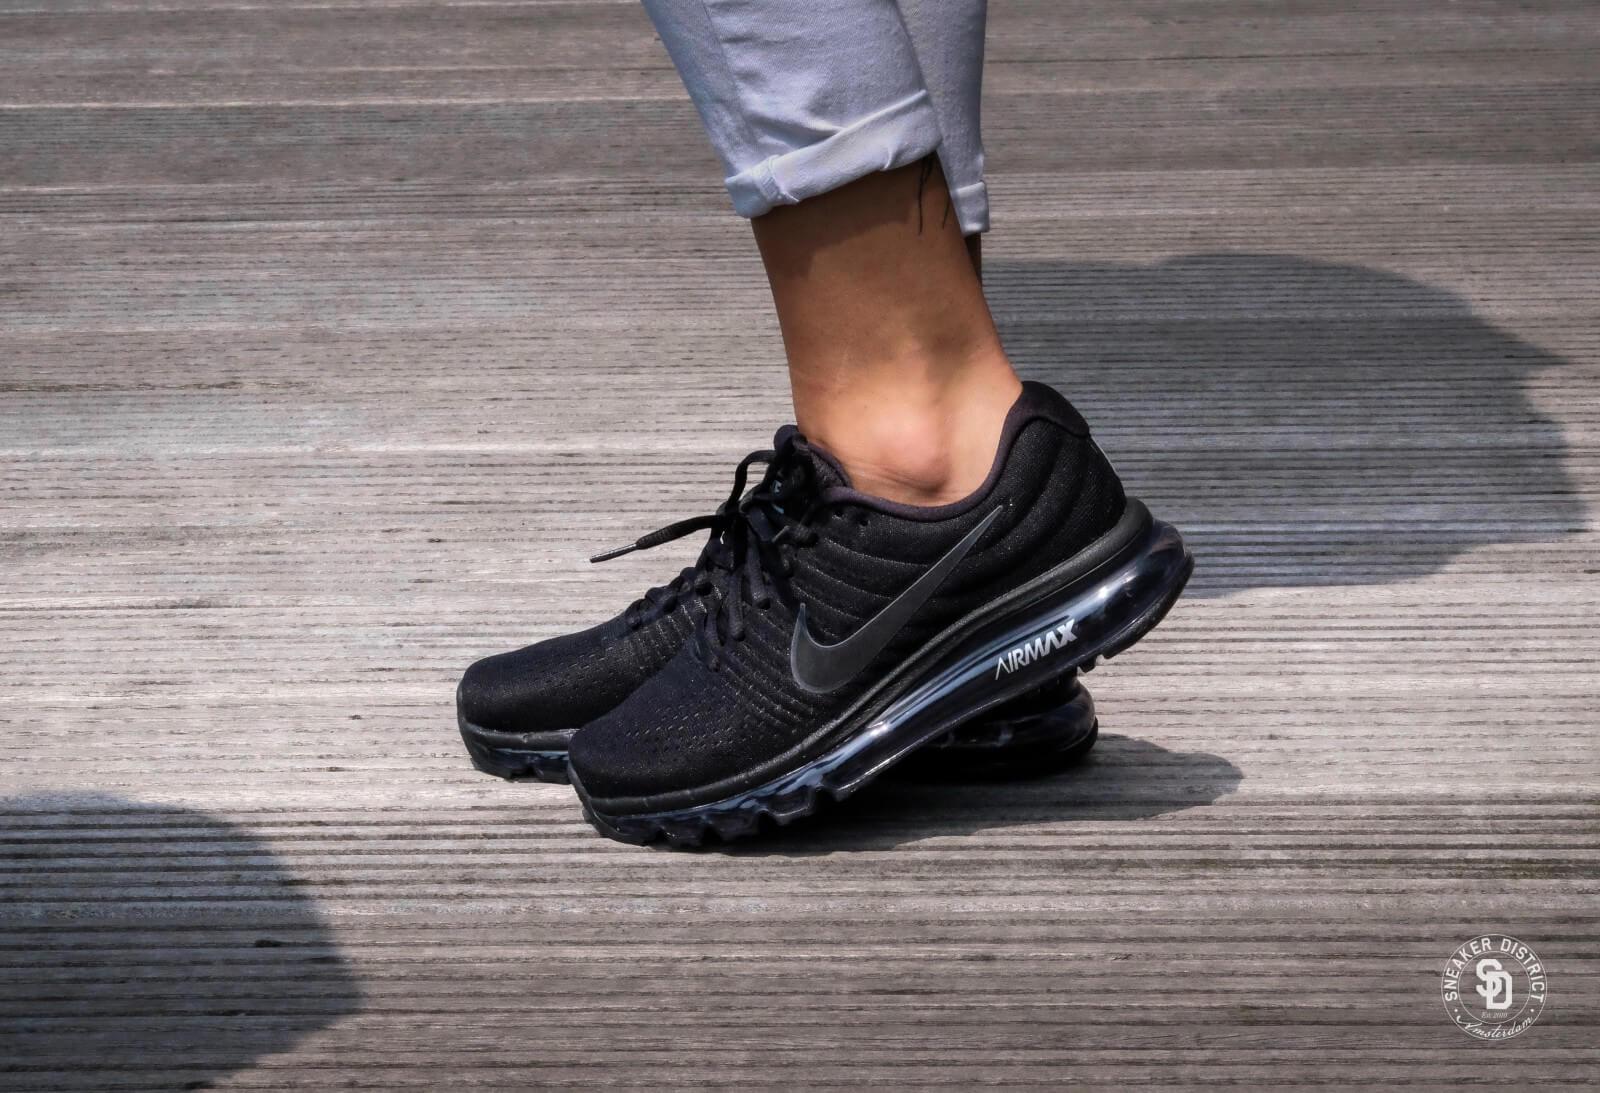 Nike Air Max 2017 | Black | Sneakers | 849559 004 | Caliroots